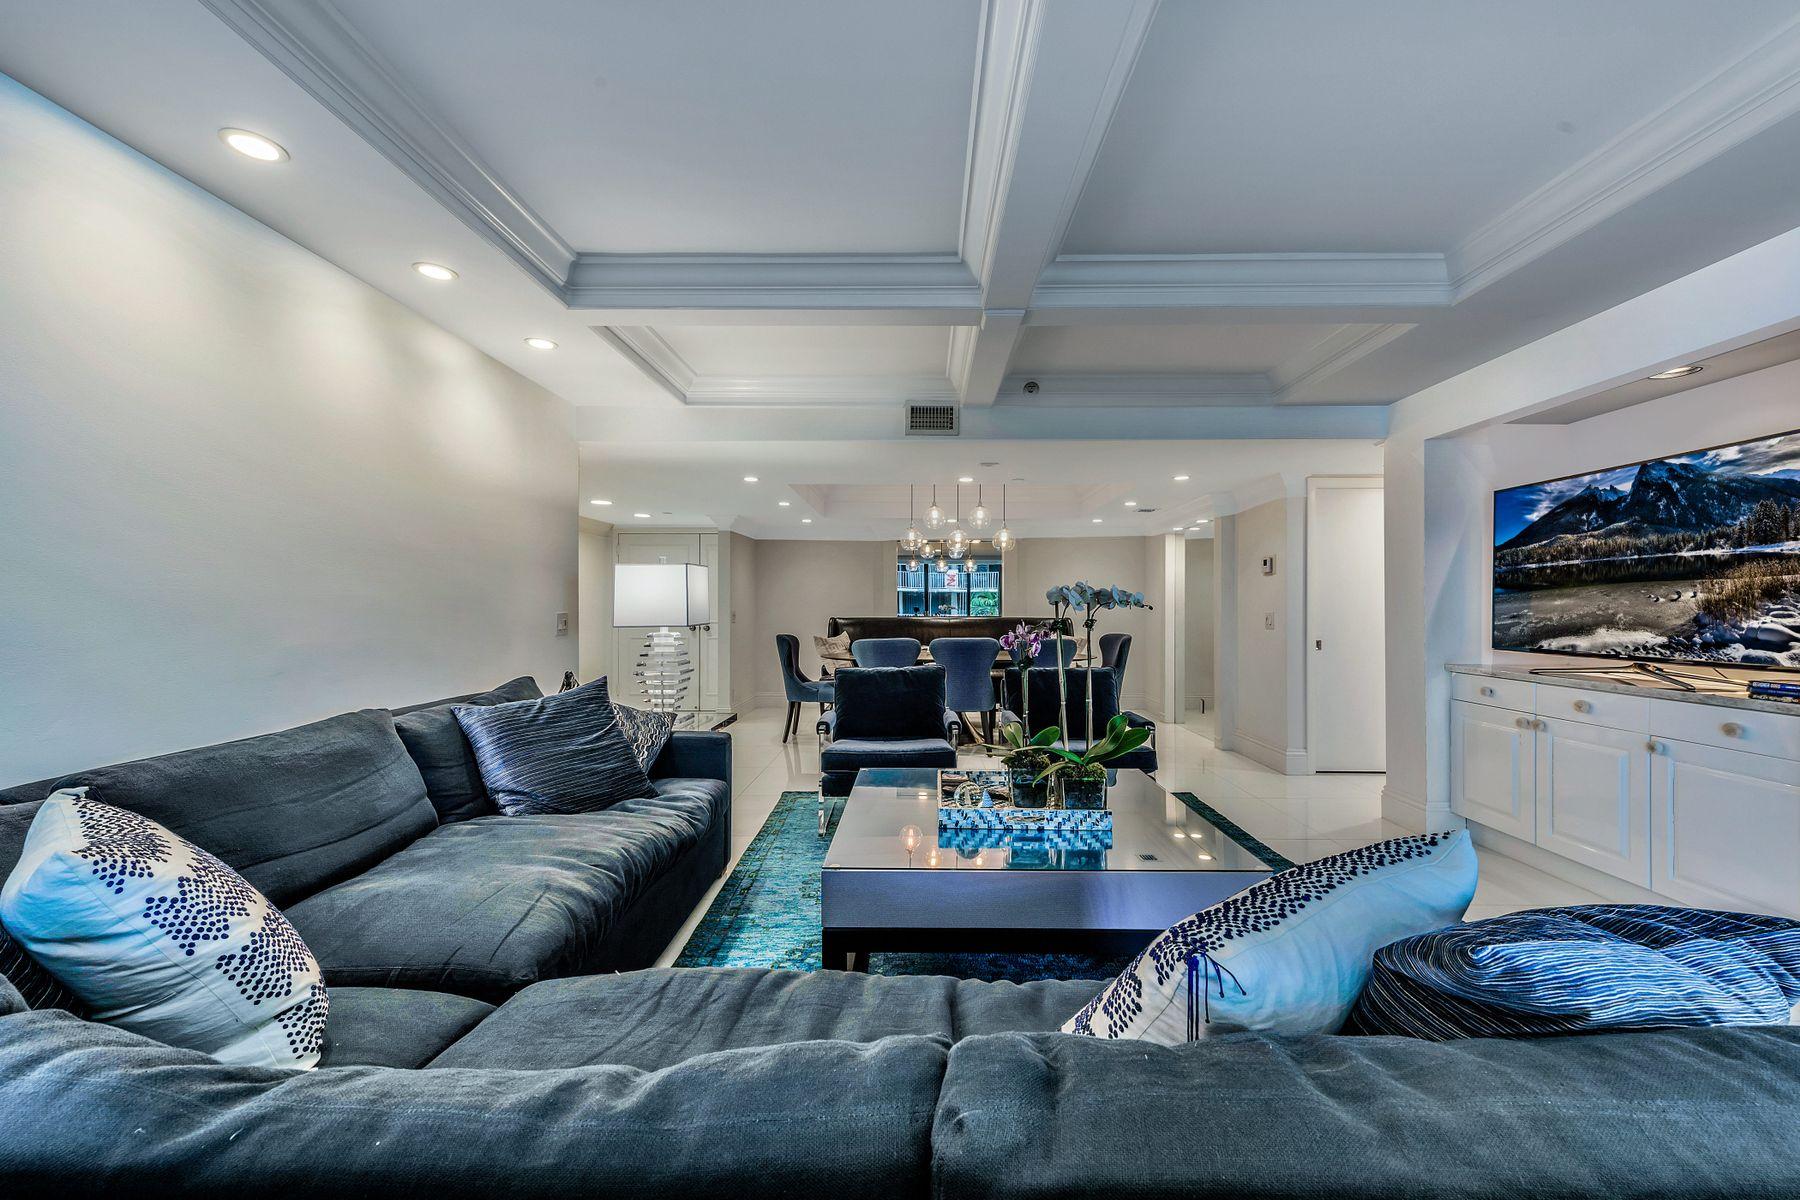 Property for Sale at 3390 S Ocean Blvd Apt 202 - Emeraude 3390 S Ocean Blvd Apt 202 Palm Beach, Florida 33480 United States